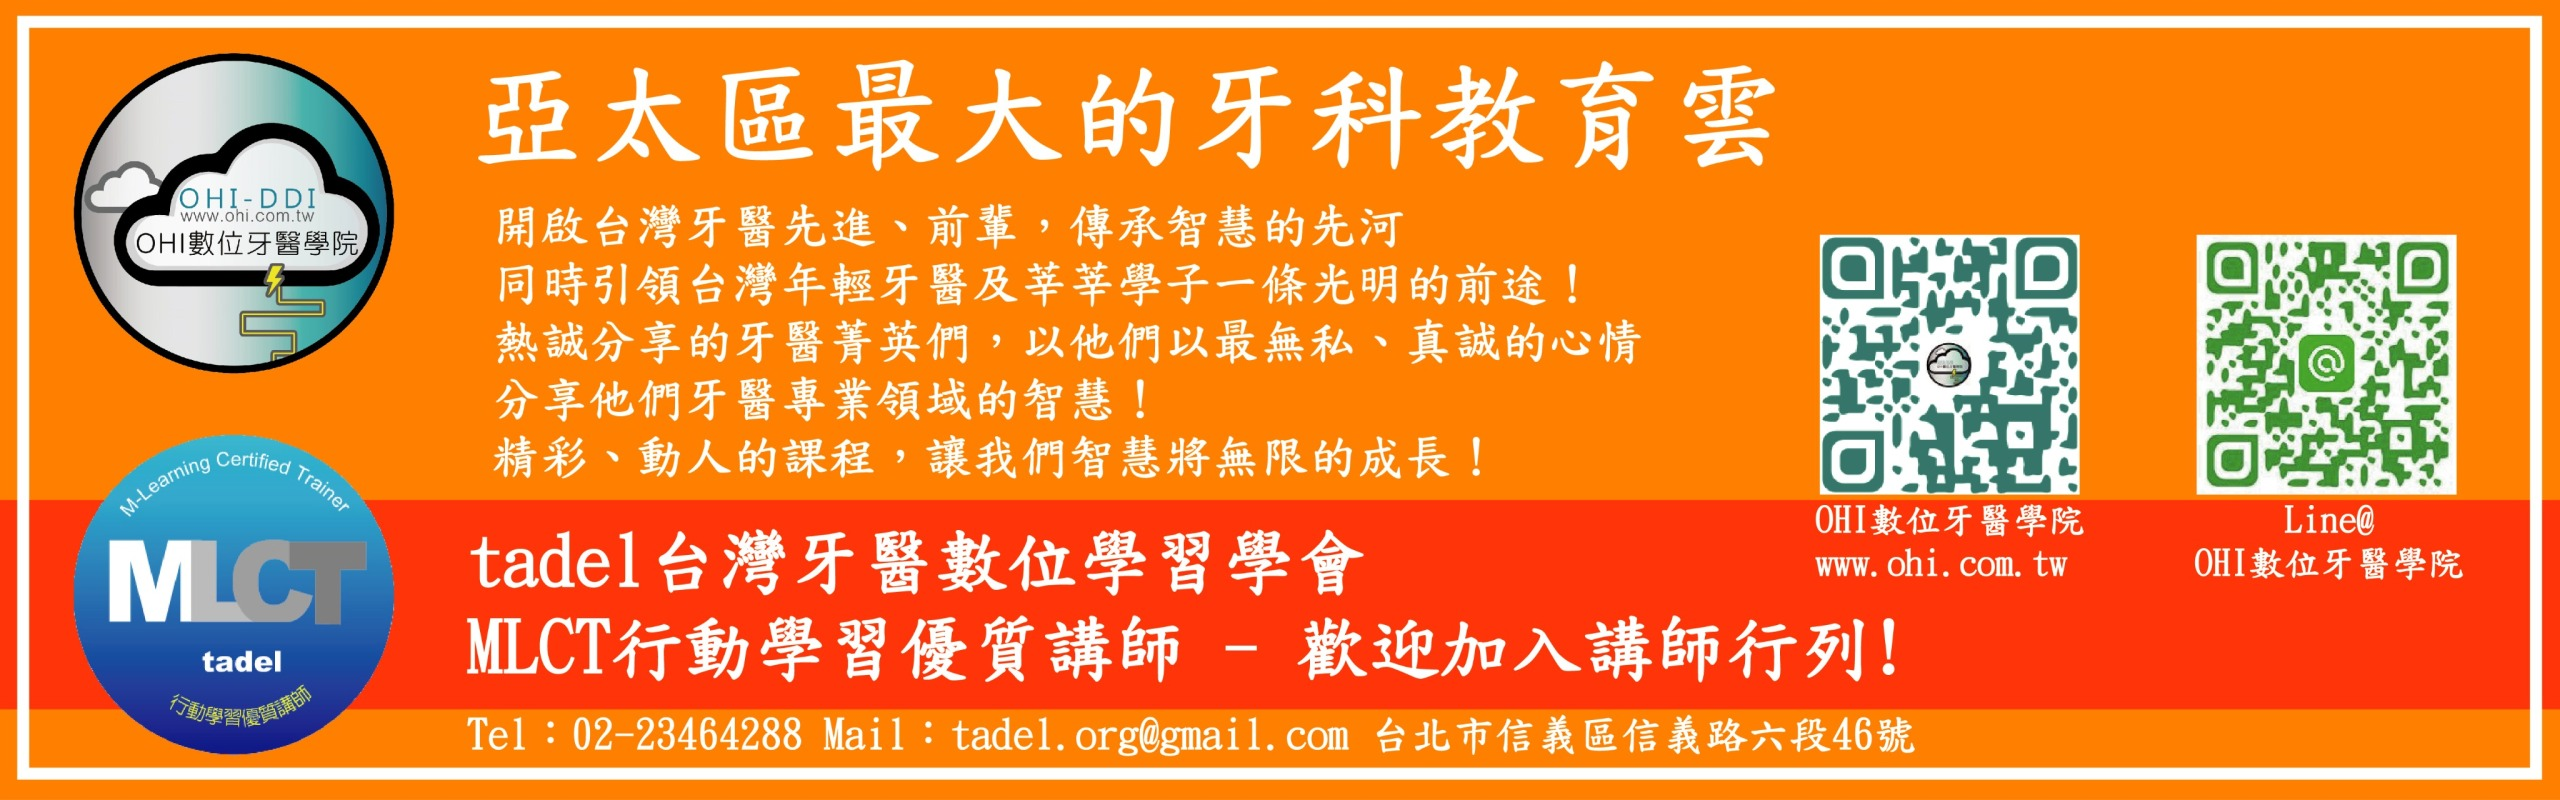 MLCT優質講師-曾明清醫師